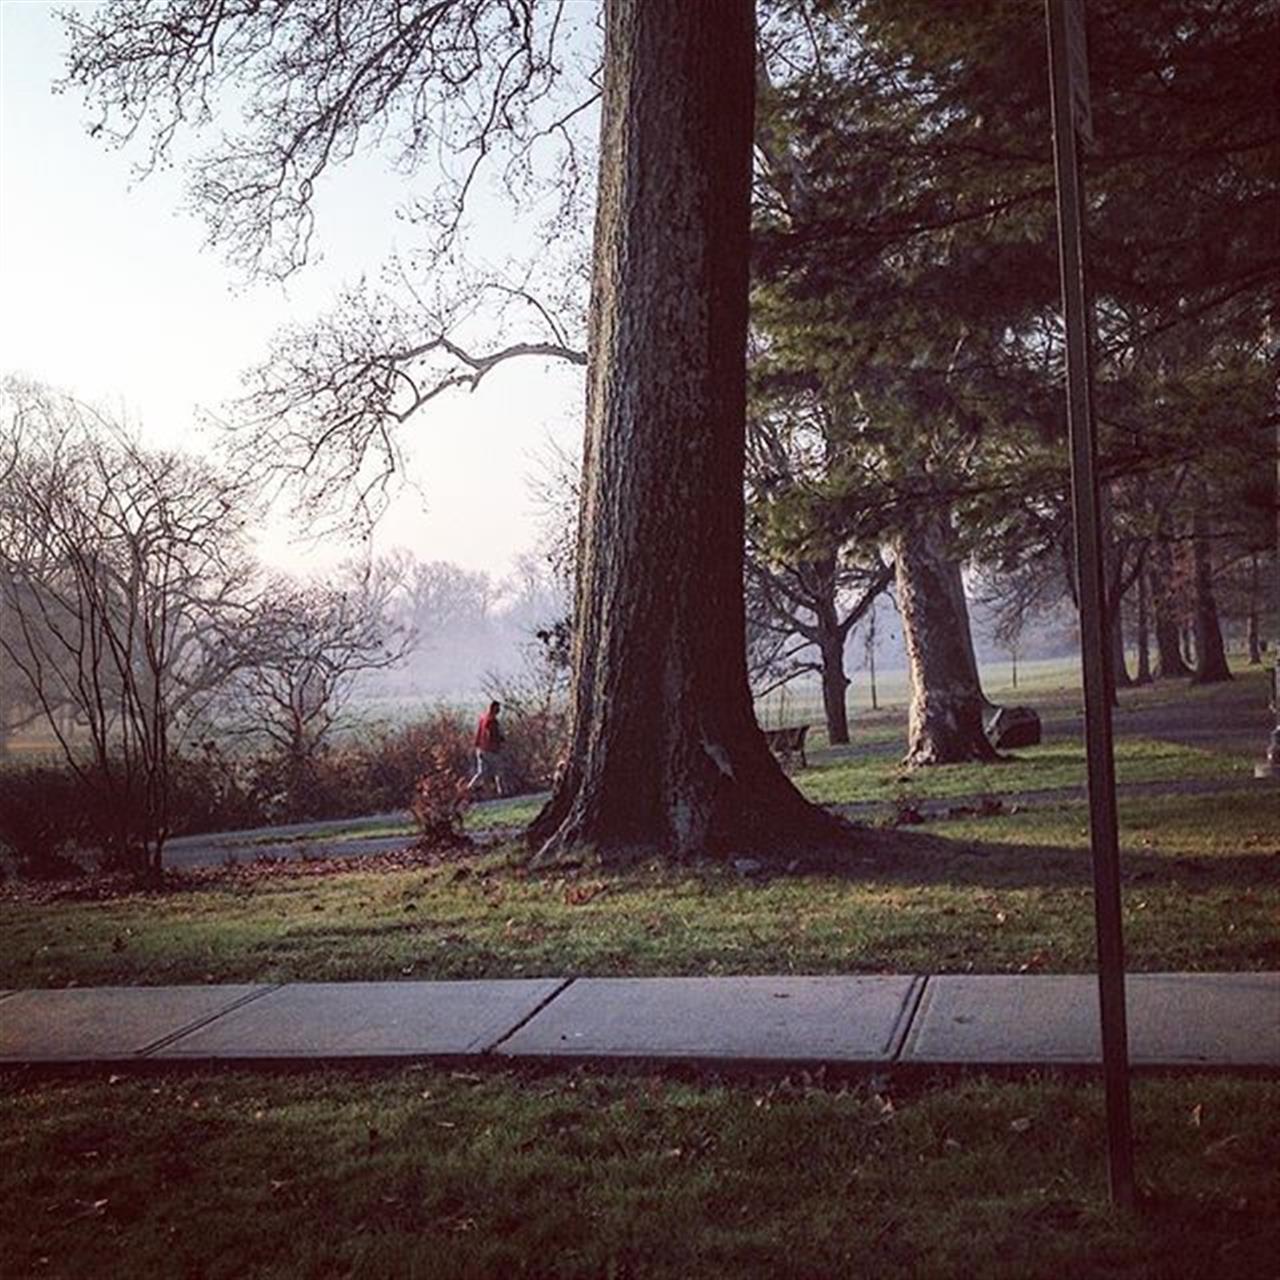 60 degrees in December ...I'll take it!???????#bairdhalstead #love #peace #parkslope #montclairnj # #halstead #halsteadproperty #cedargrovenj #exploreyourhood #leadingrelocal #thursday #nature#nj #ny #park